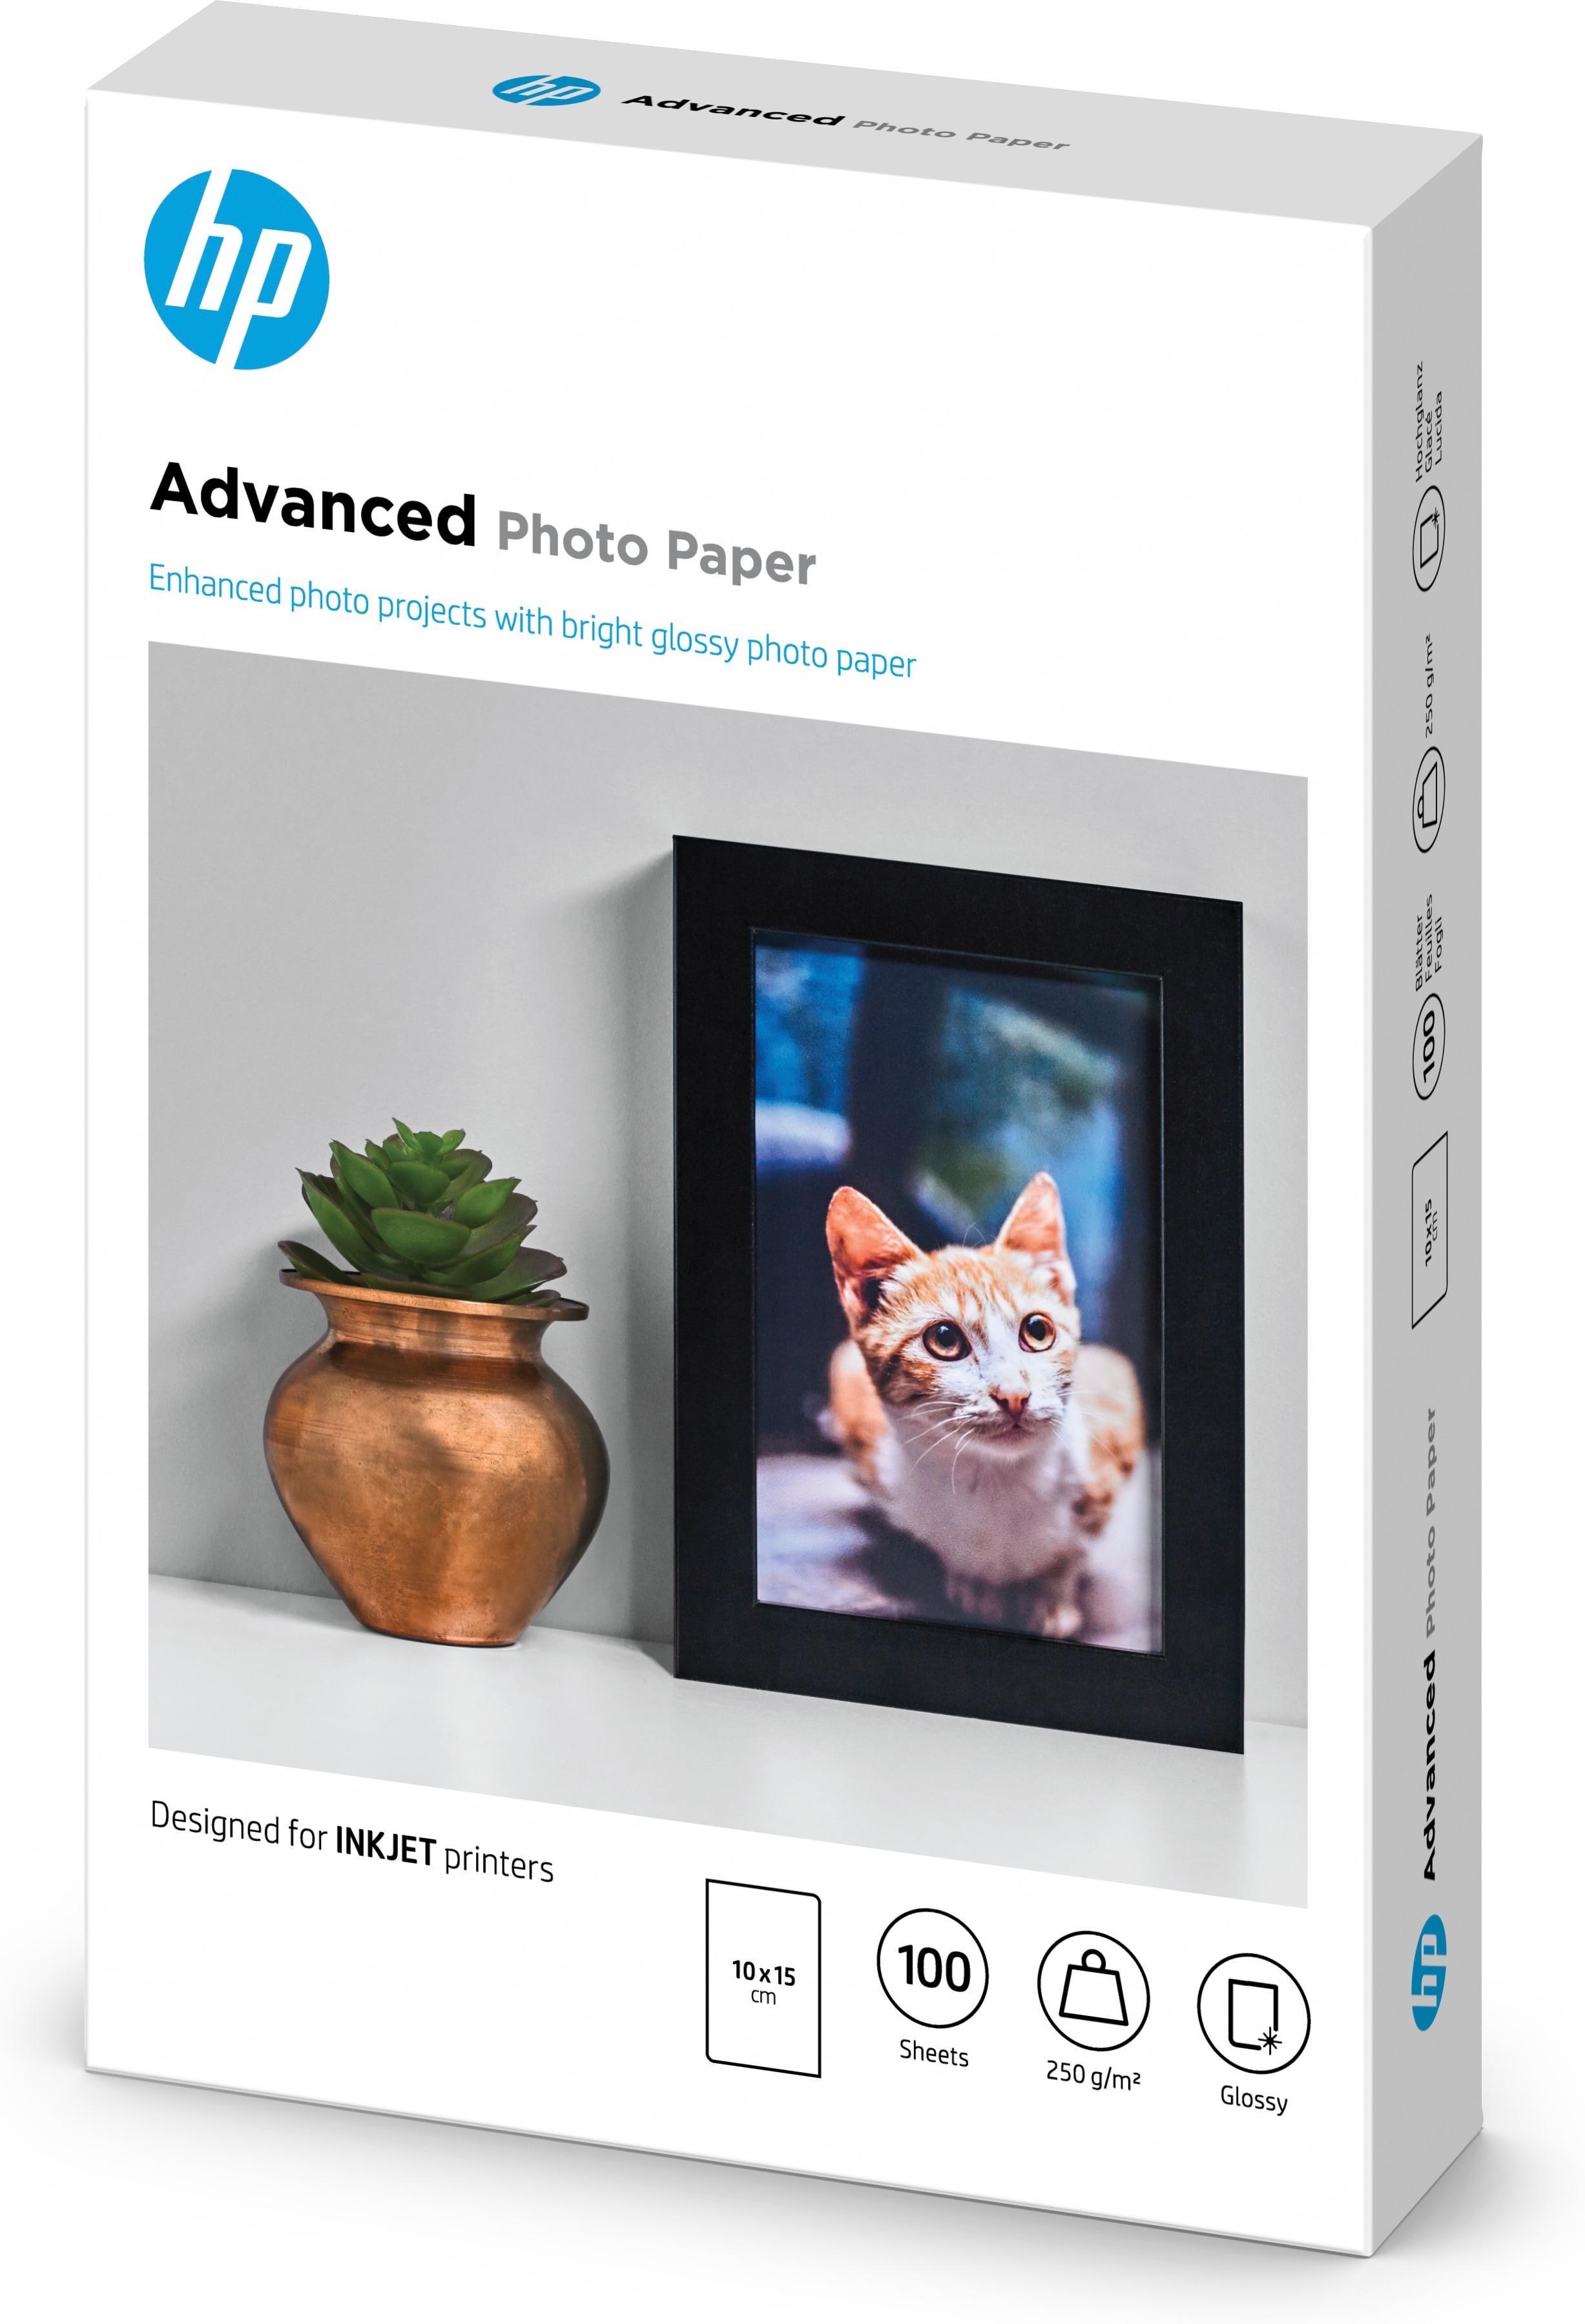 Q8692A Advanced Photo Paper Glossy (10 x 15 cm, 100 vellen, 250 g/m²)